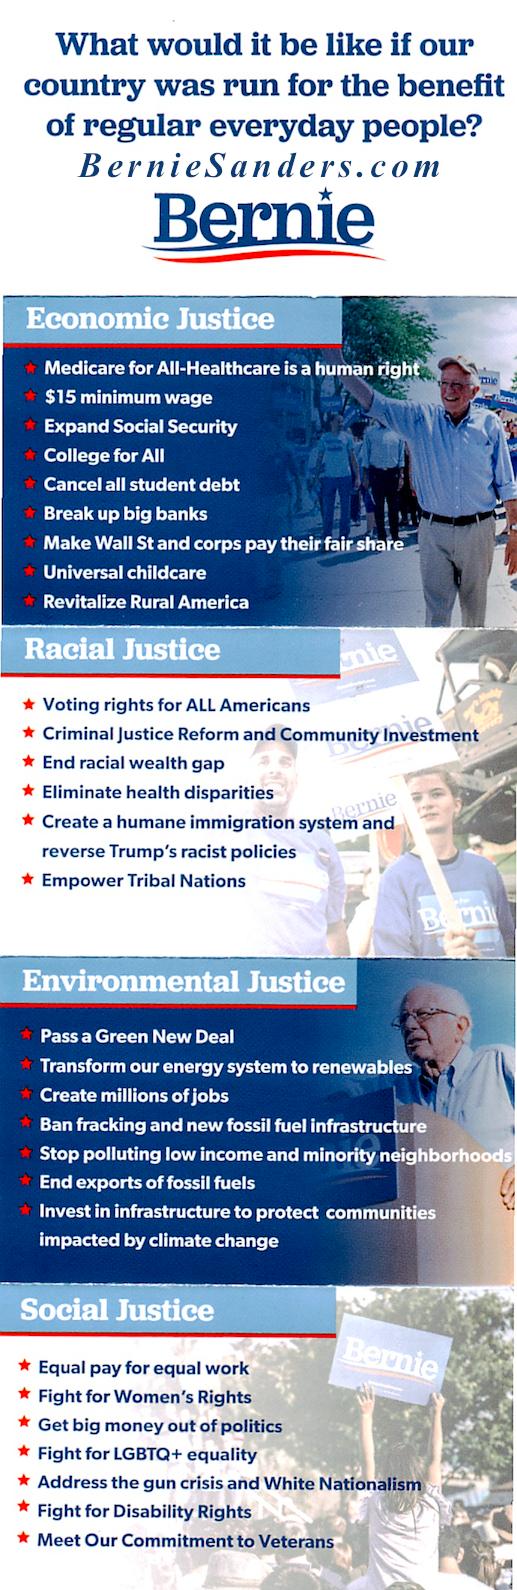 Bernie info panel